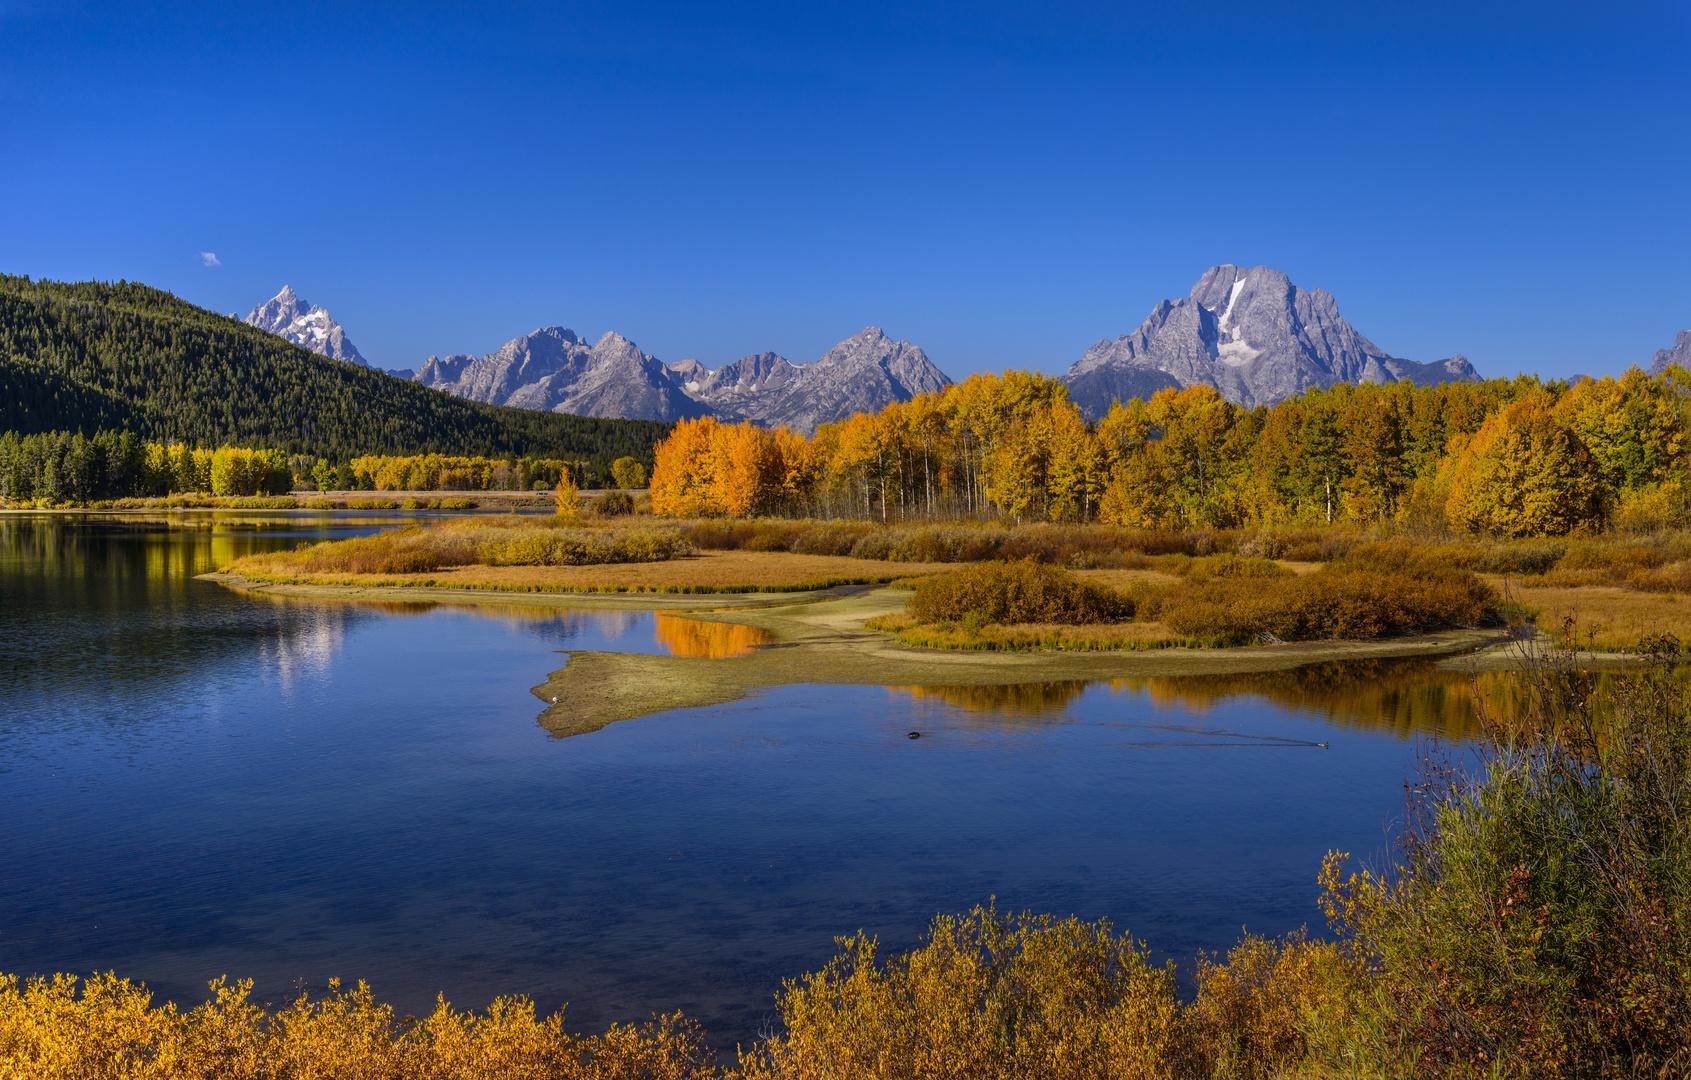 Herbstlandschaft am Oxbow Bend gegen Teton Range, Wyoming, USA